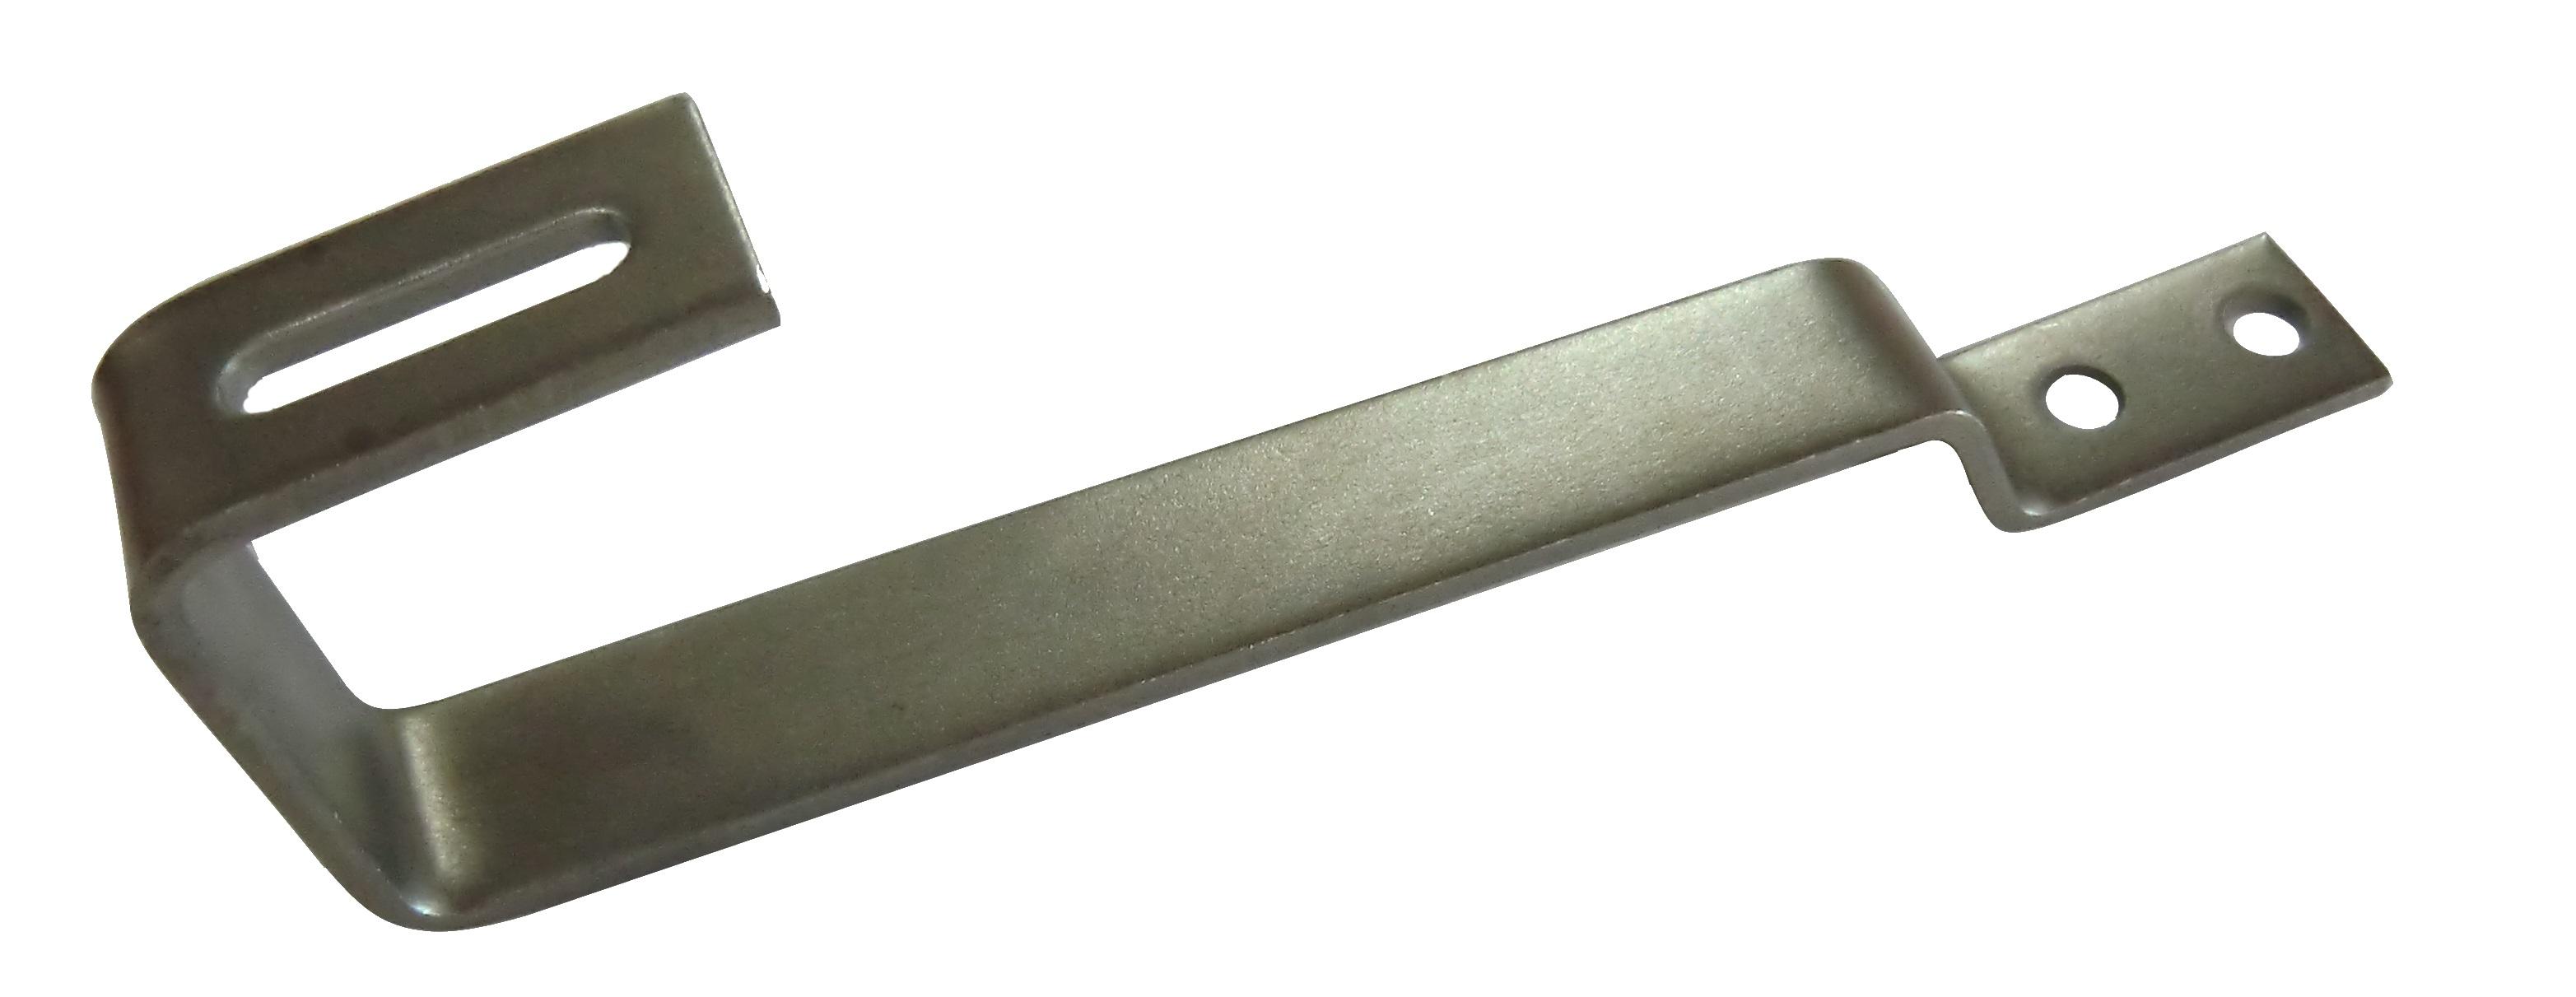 1 Stk Dachhaken Biberschwanz 5x30mm Mat. 1.4016 PVF31050--